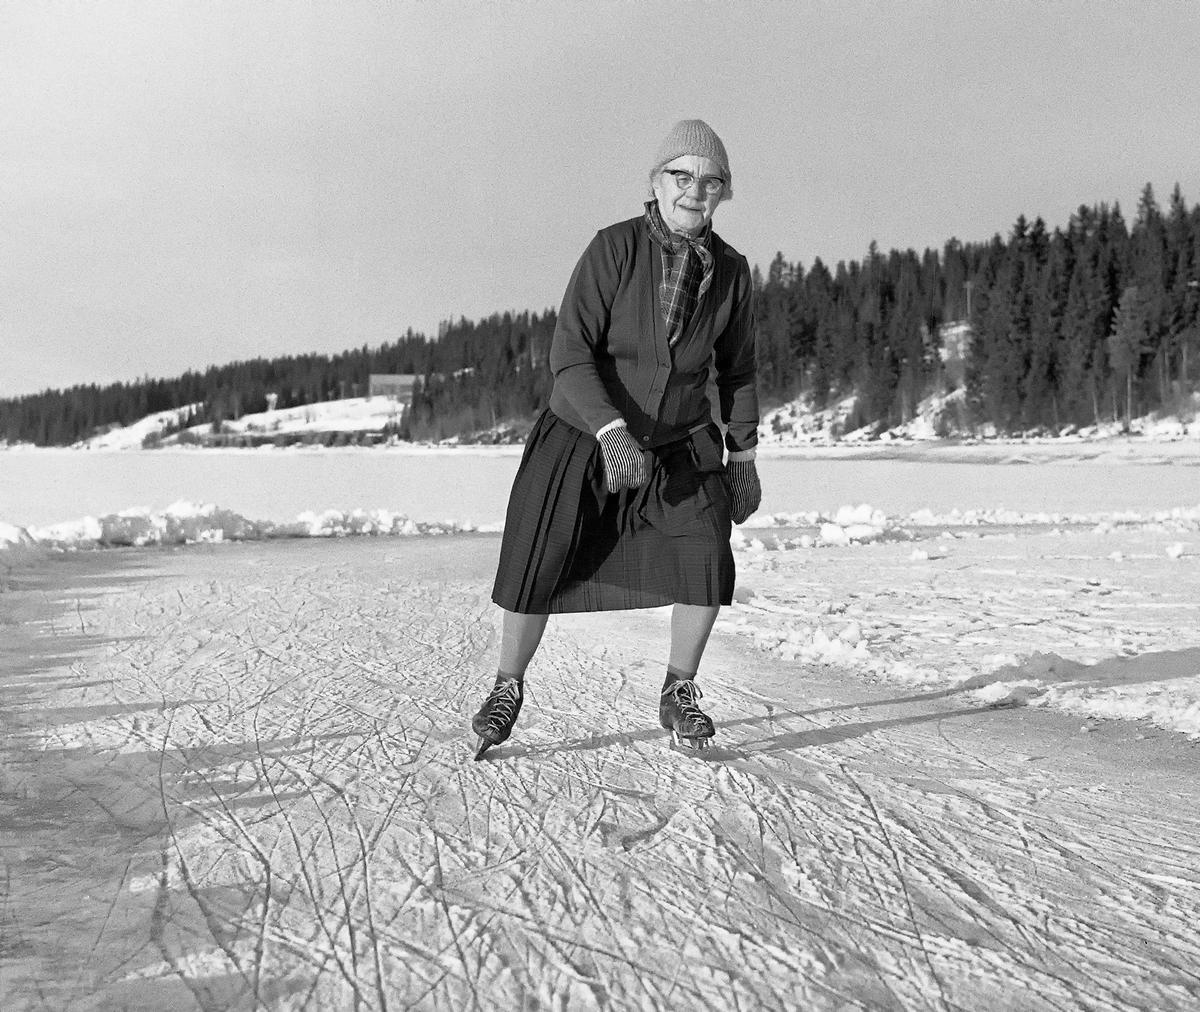 Bilde fra 1964 viser 80-årige Karoline Nergaard som går på skøyter på Osensjøen i Trysil. (Foto/Photo)